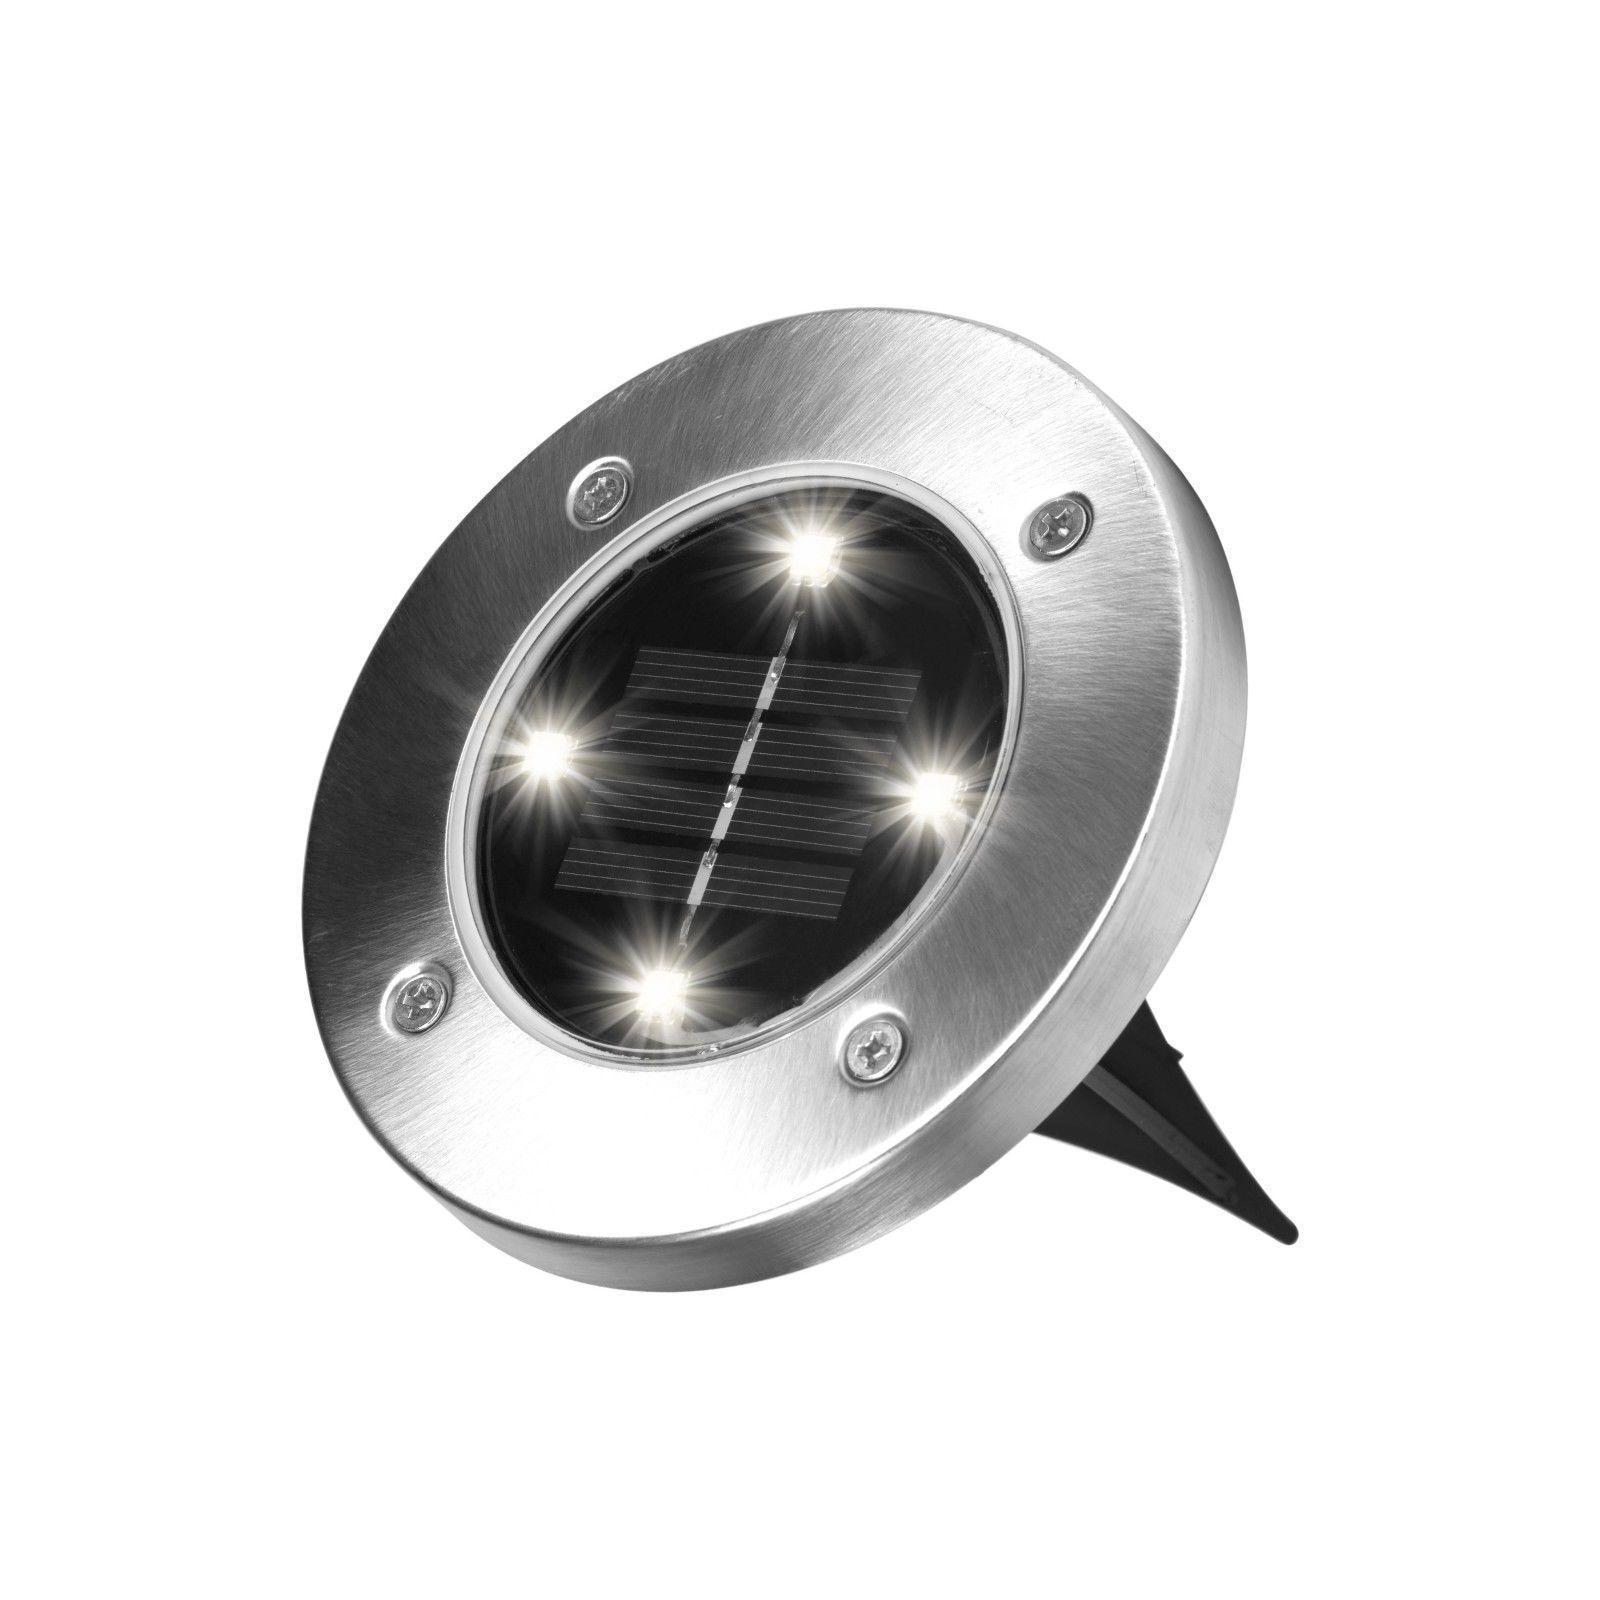 US 4X Lights Solar Power Lights Waterproof